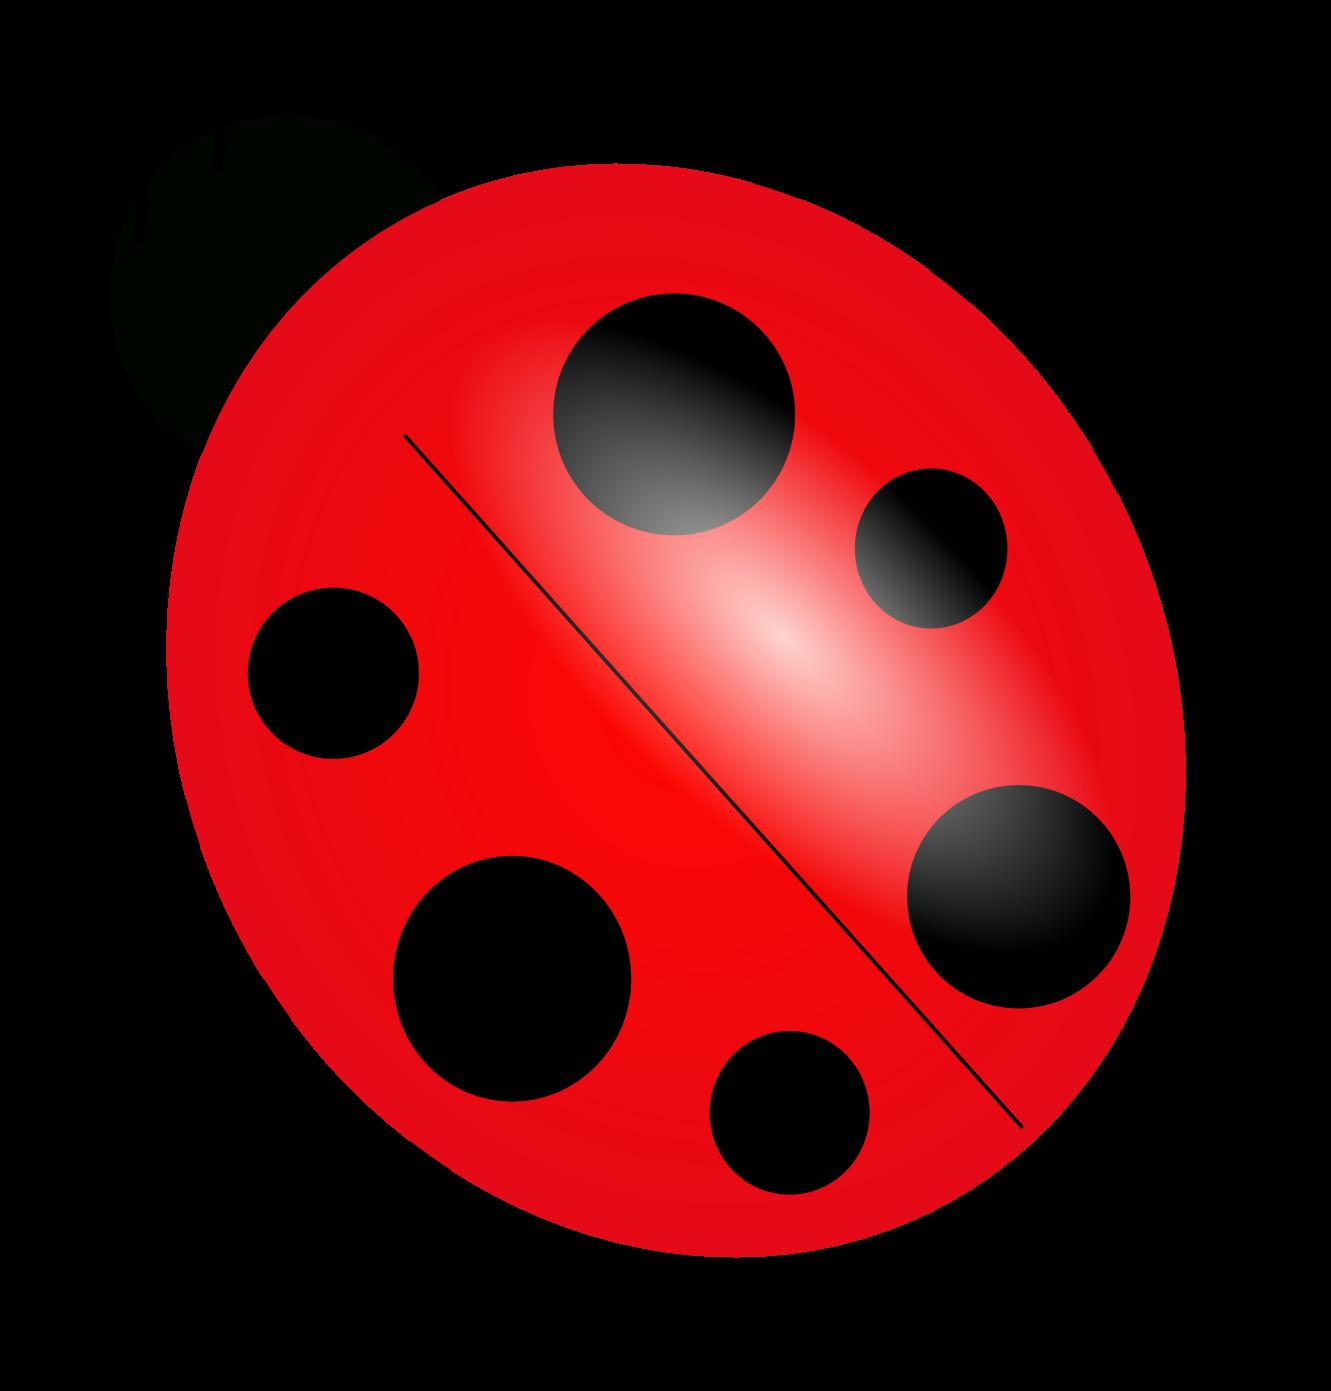 clip download Ladybugs PNG Transparent Images